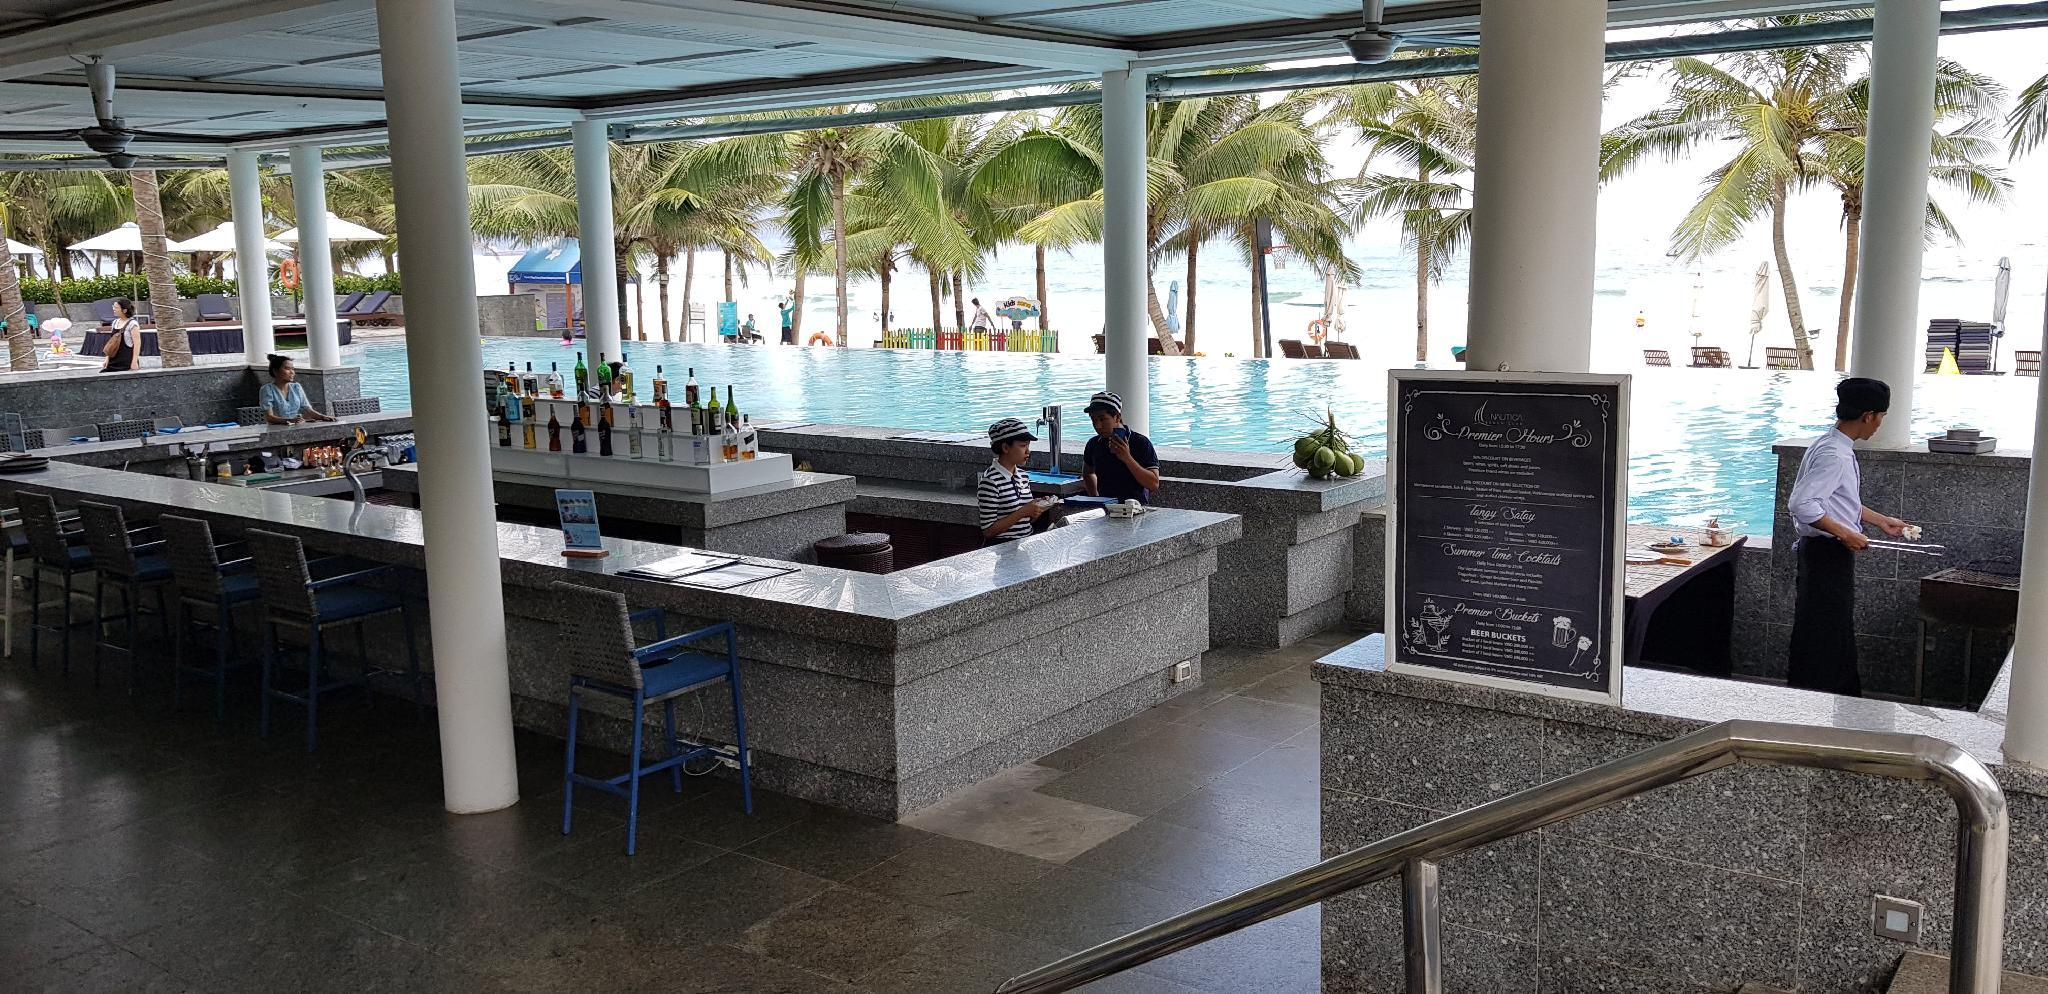 Pre. 4 BRs Beauty Villas At Da Nang Beach Resort